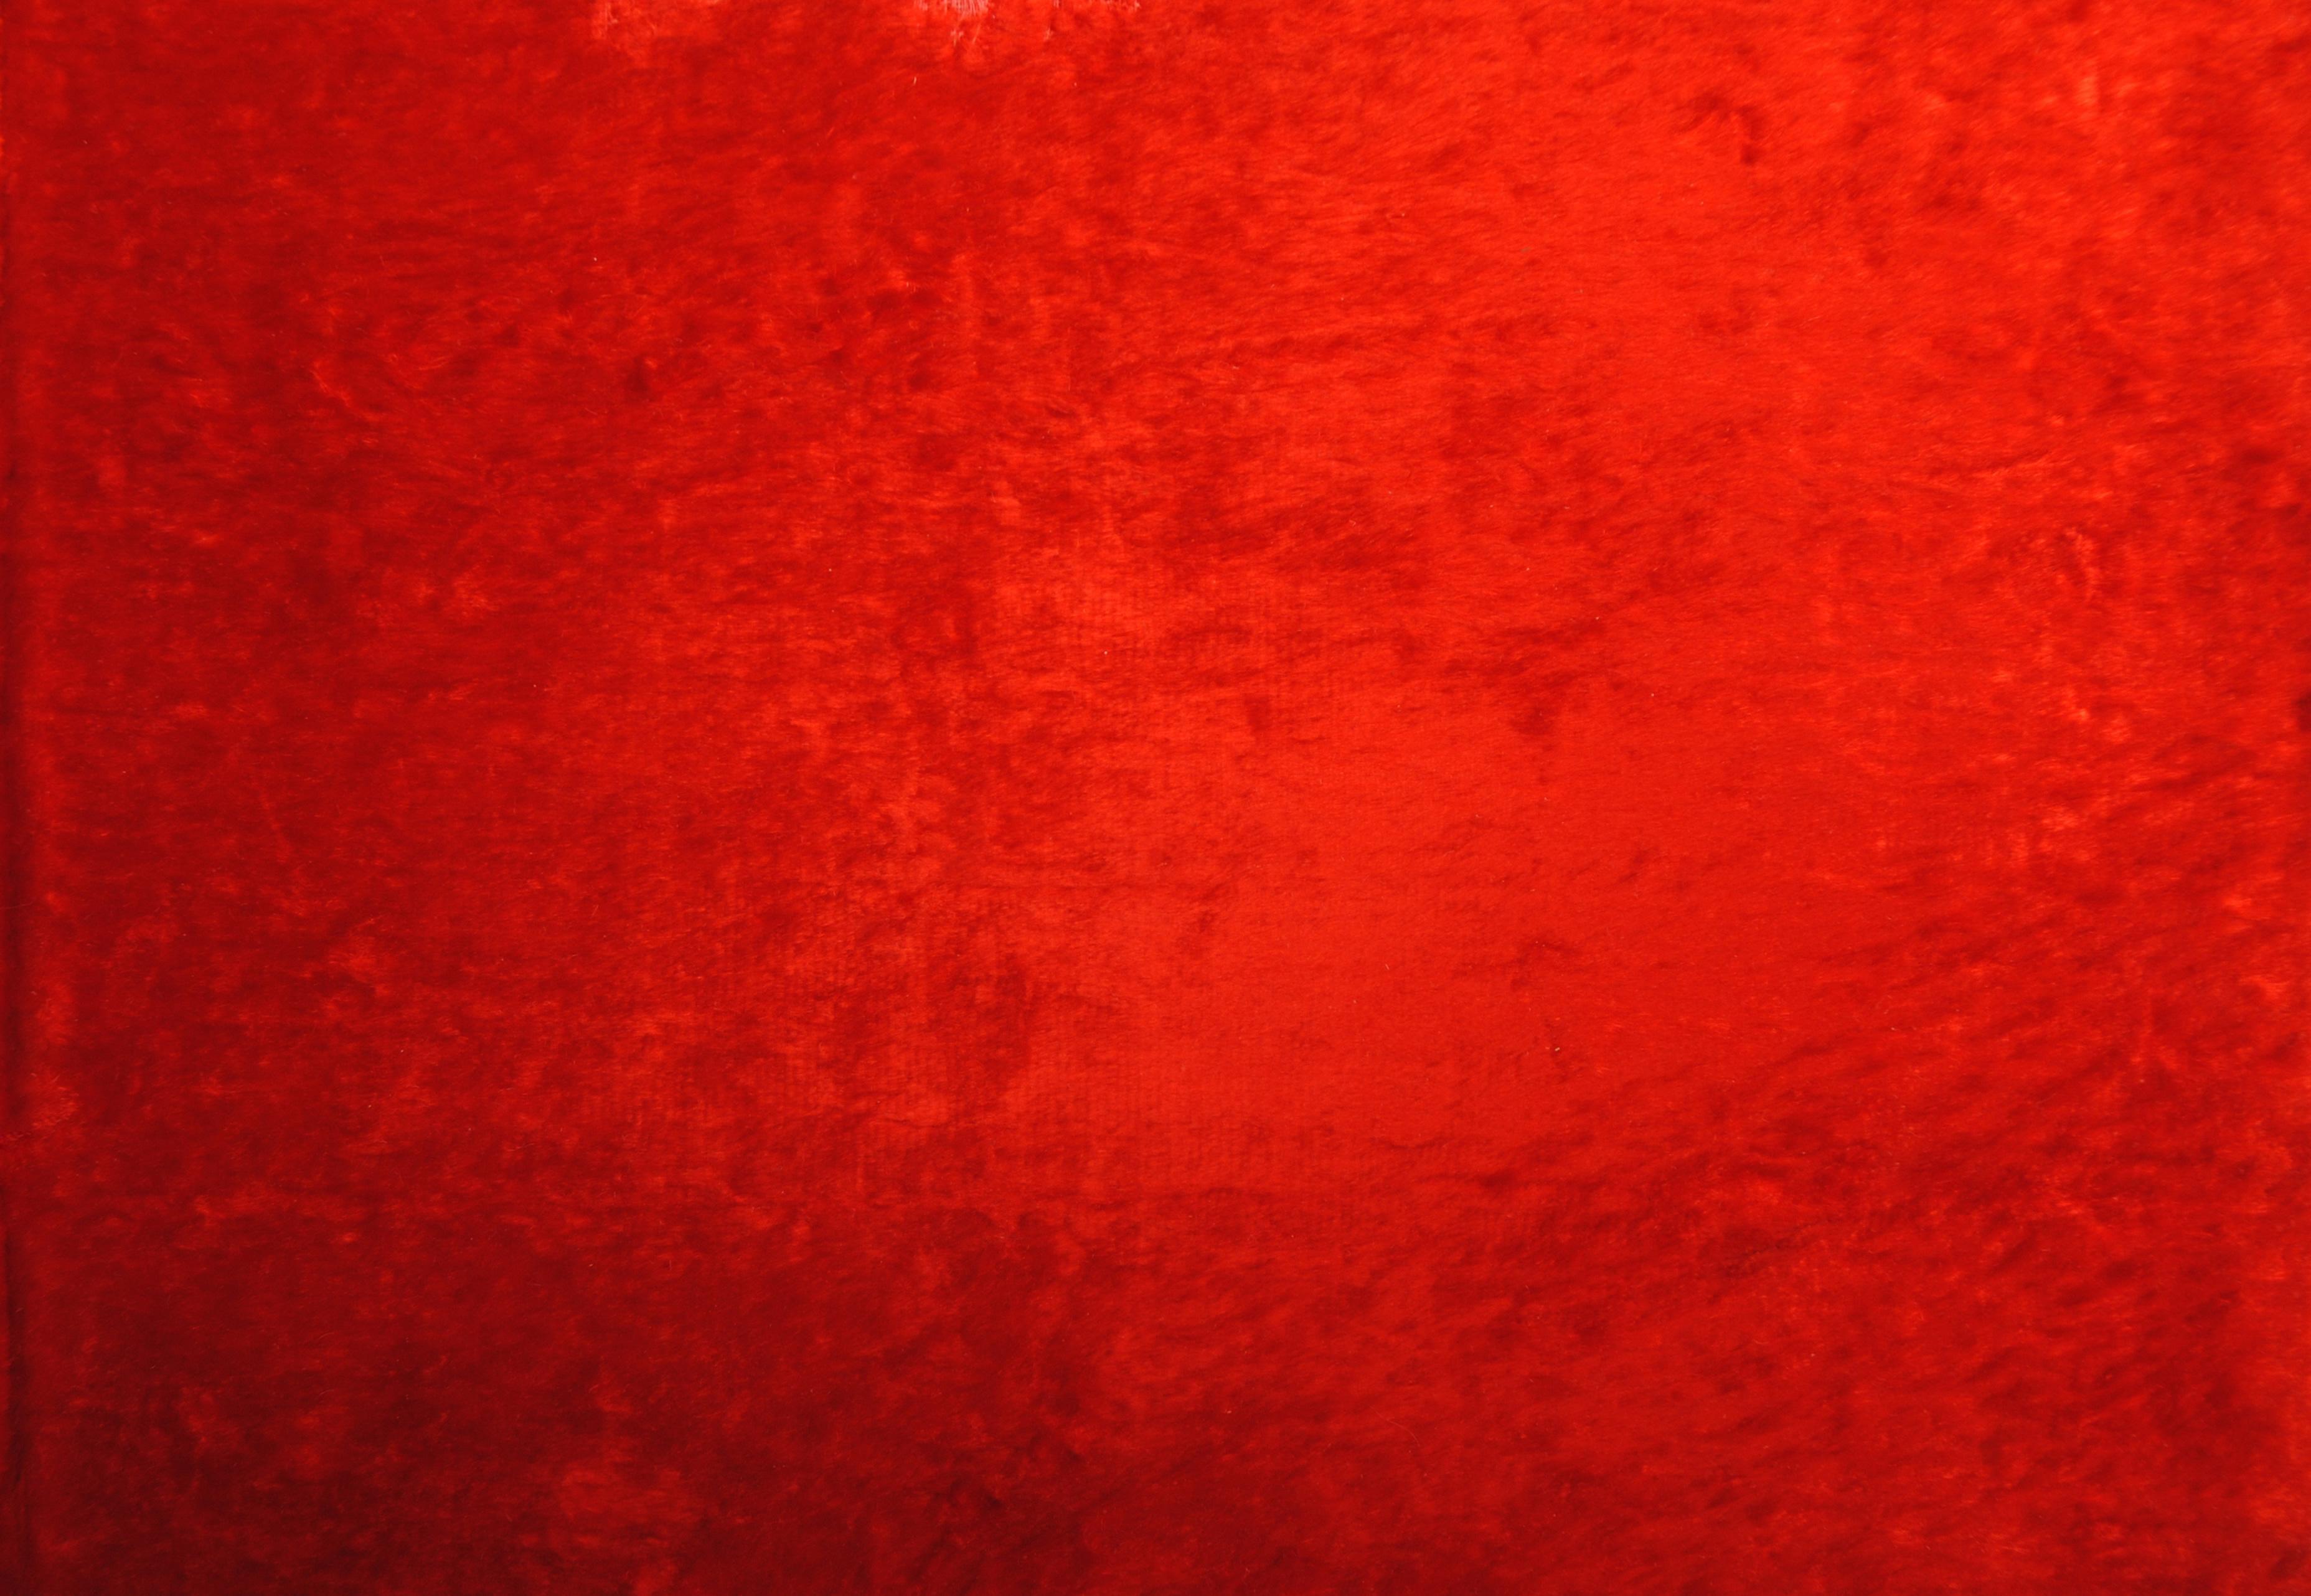 Download Texture Red Velvet Wallpaper 3712x2564 Full HD Wallpapers 3712x2564